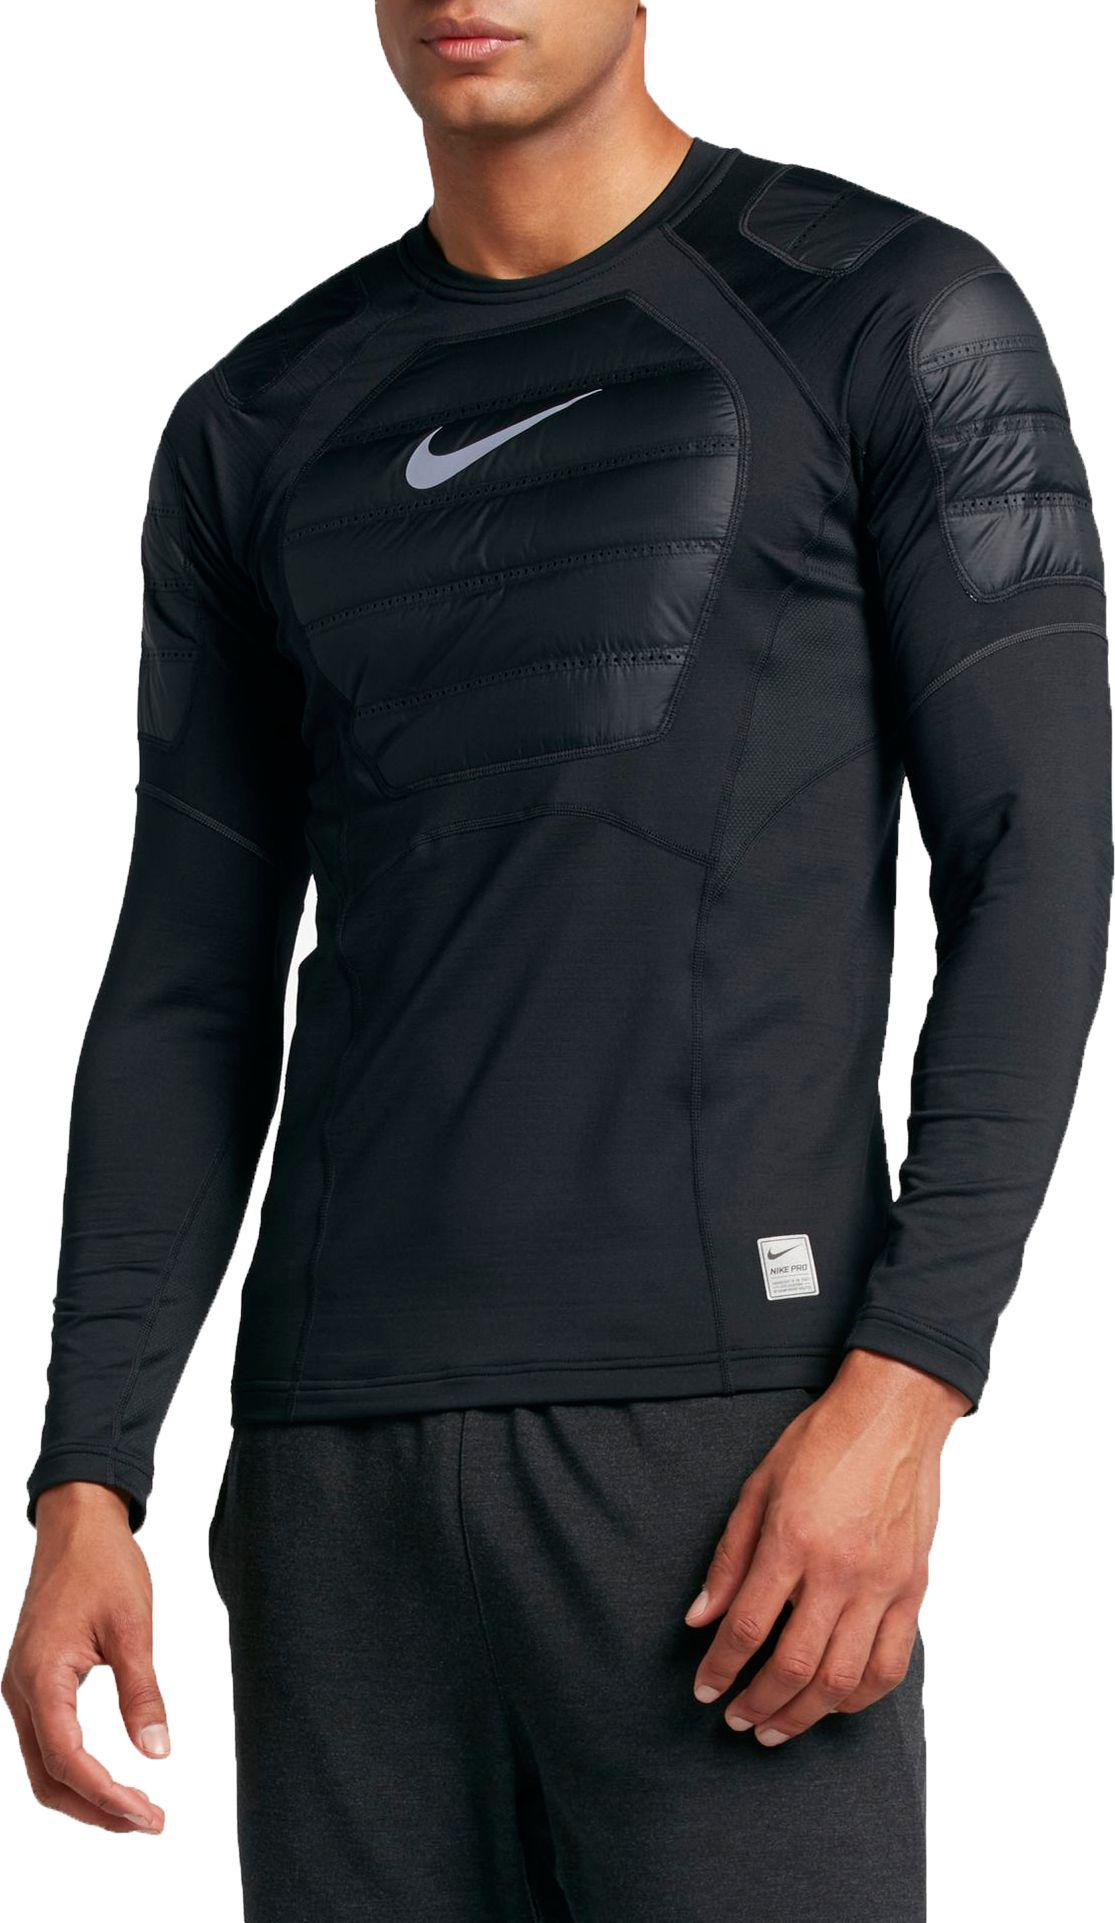 d4639b23cfdd9 Nike Aeroloft Mens Long Sleeve Running Top